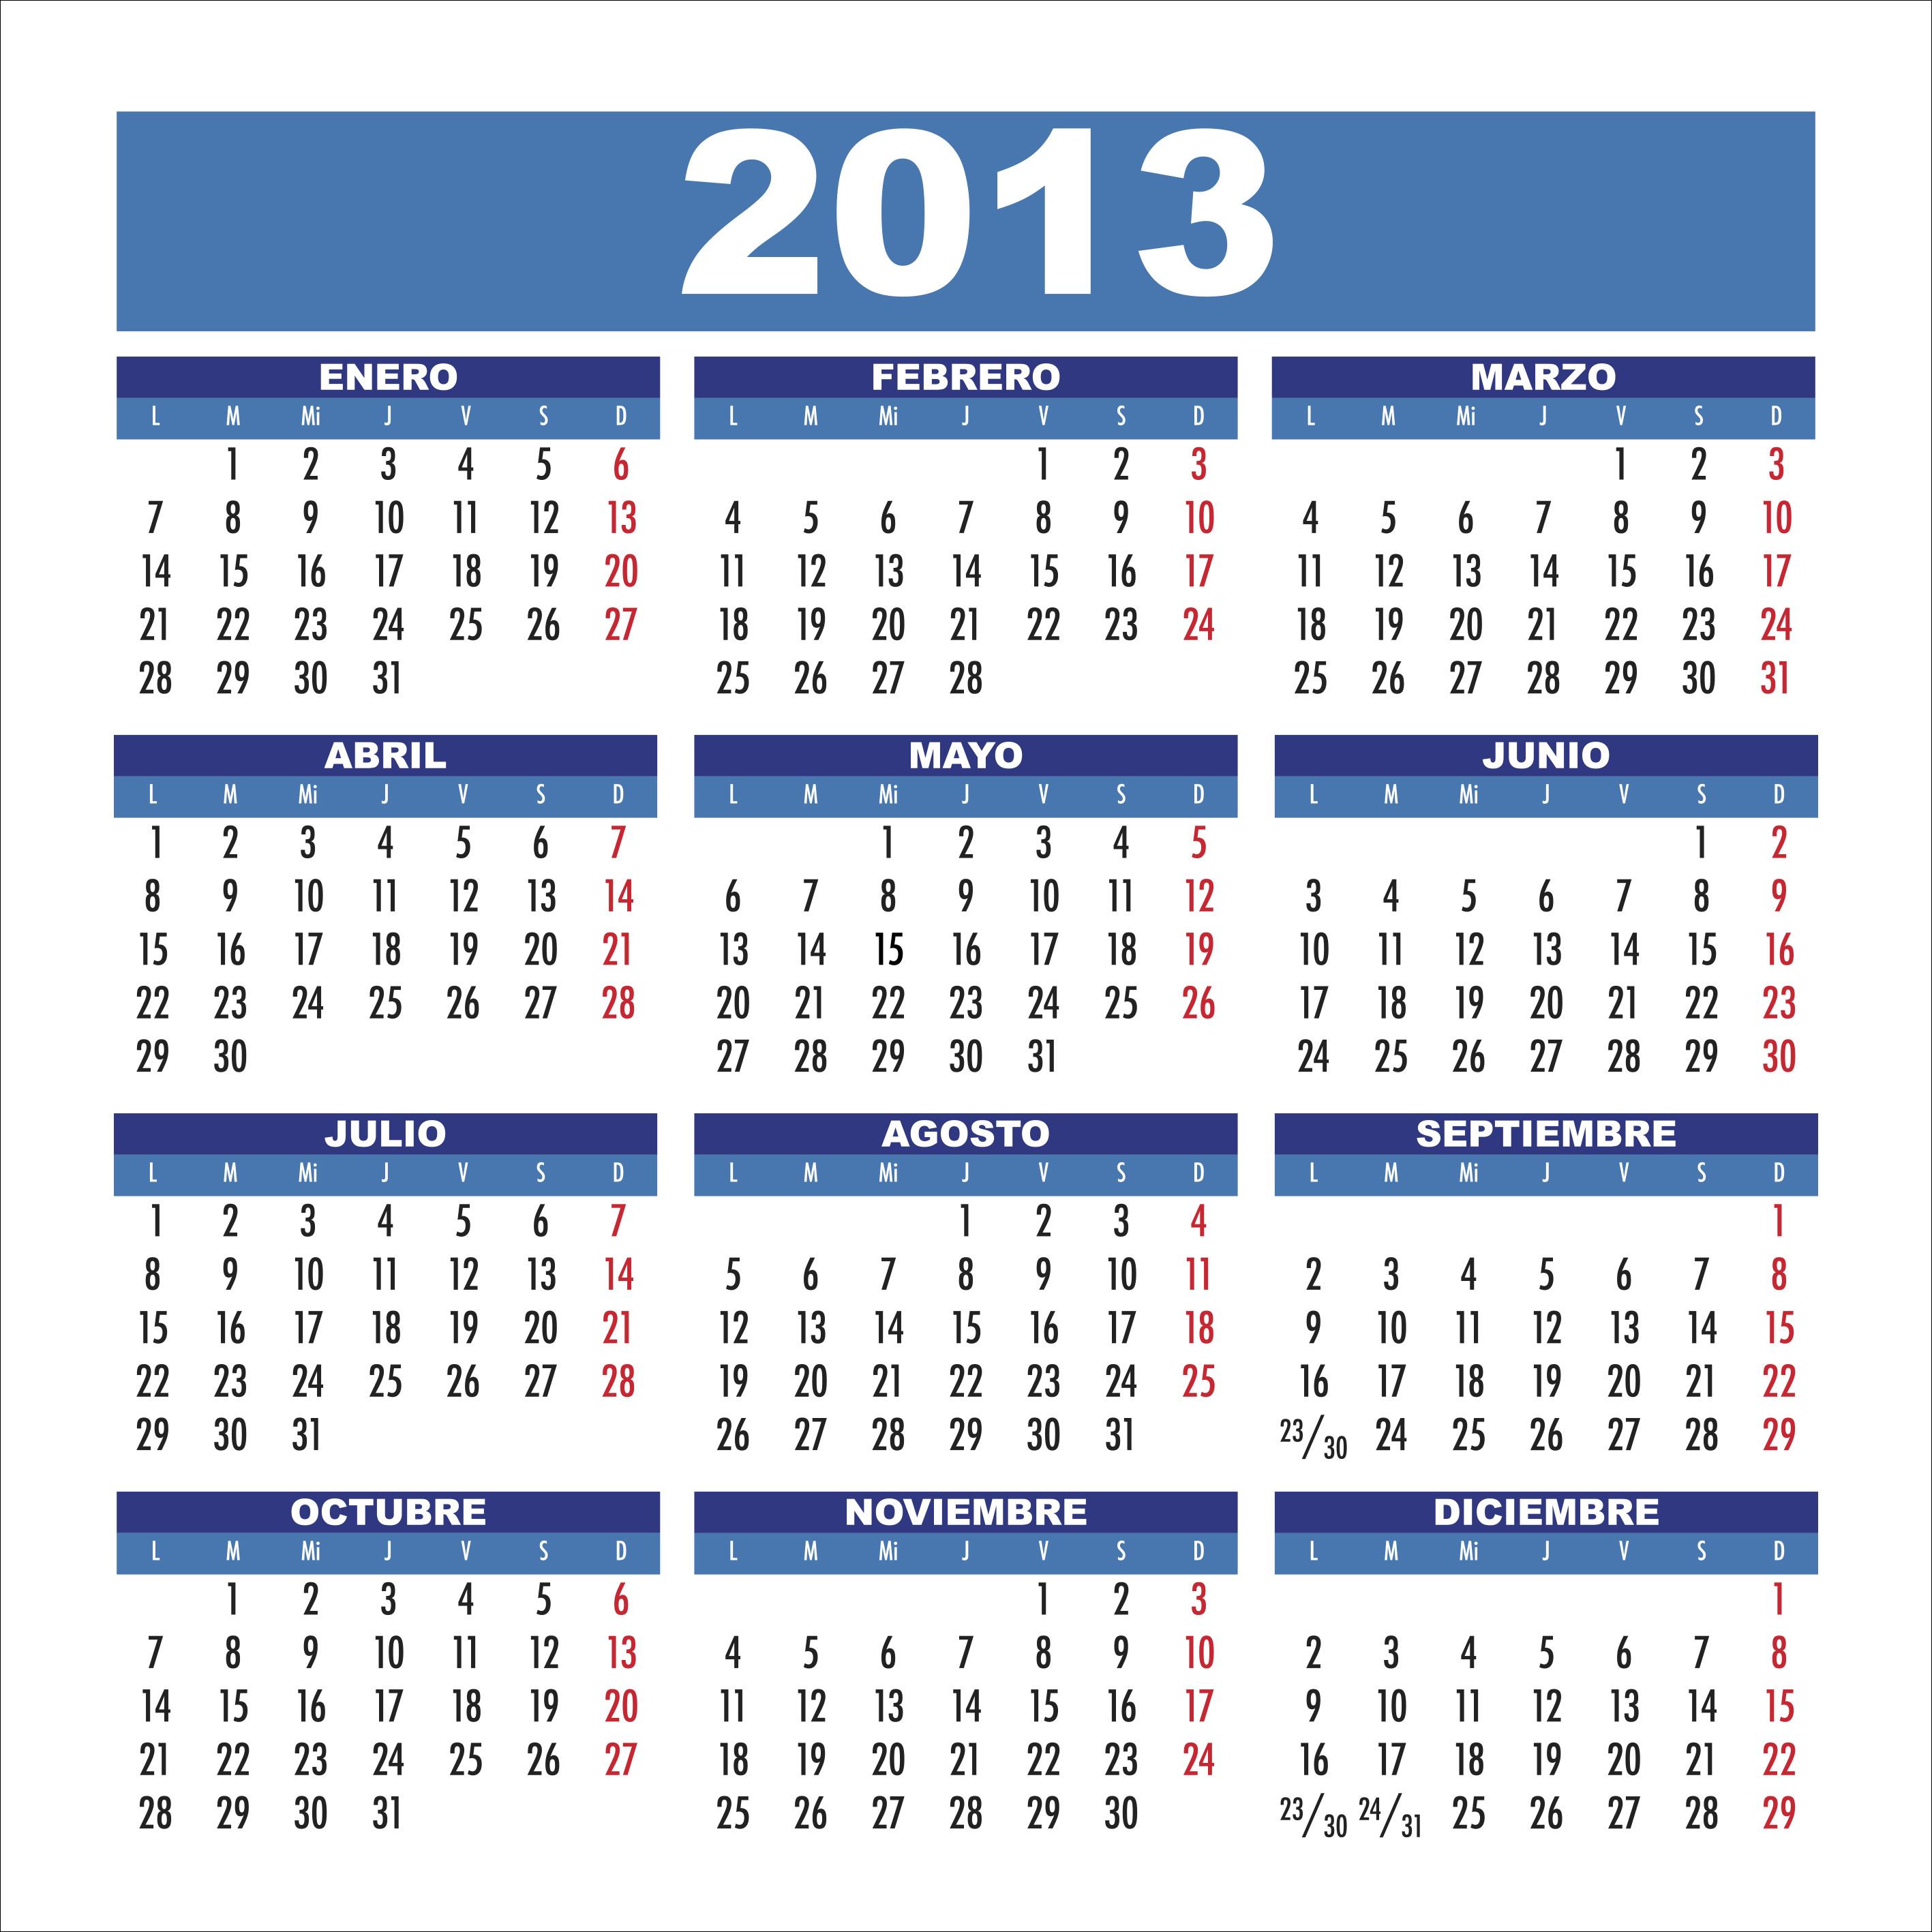 Calendario con foto 2013 para imprimir gratis 72